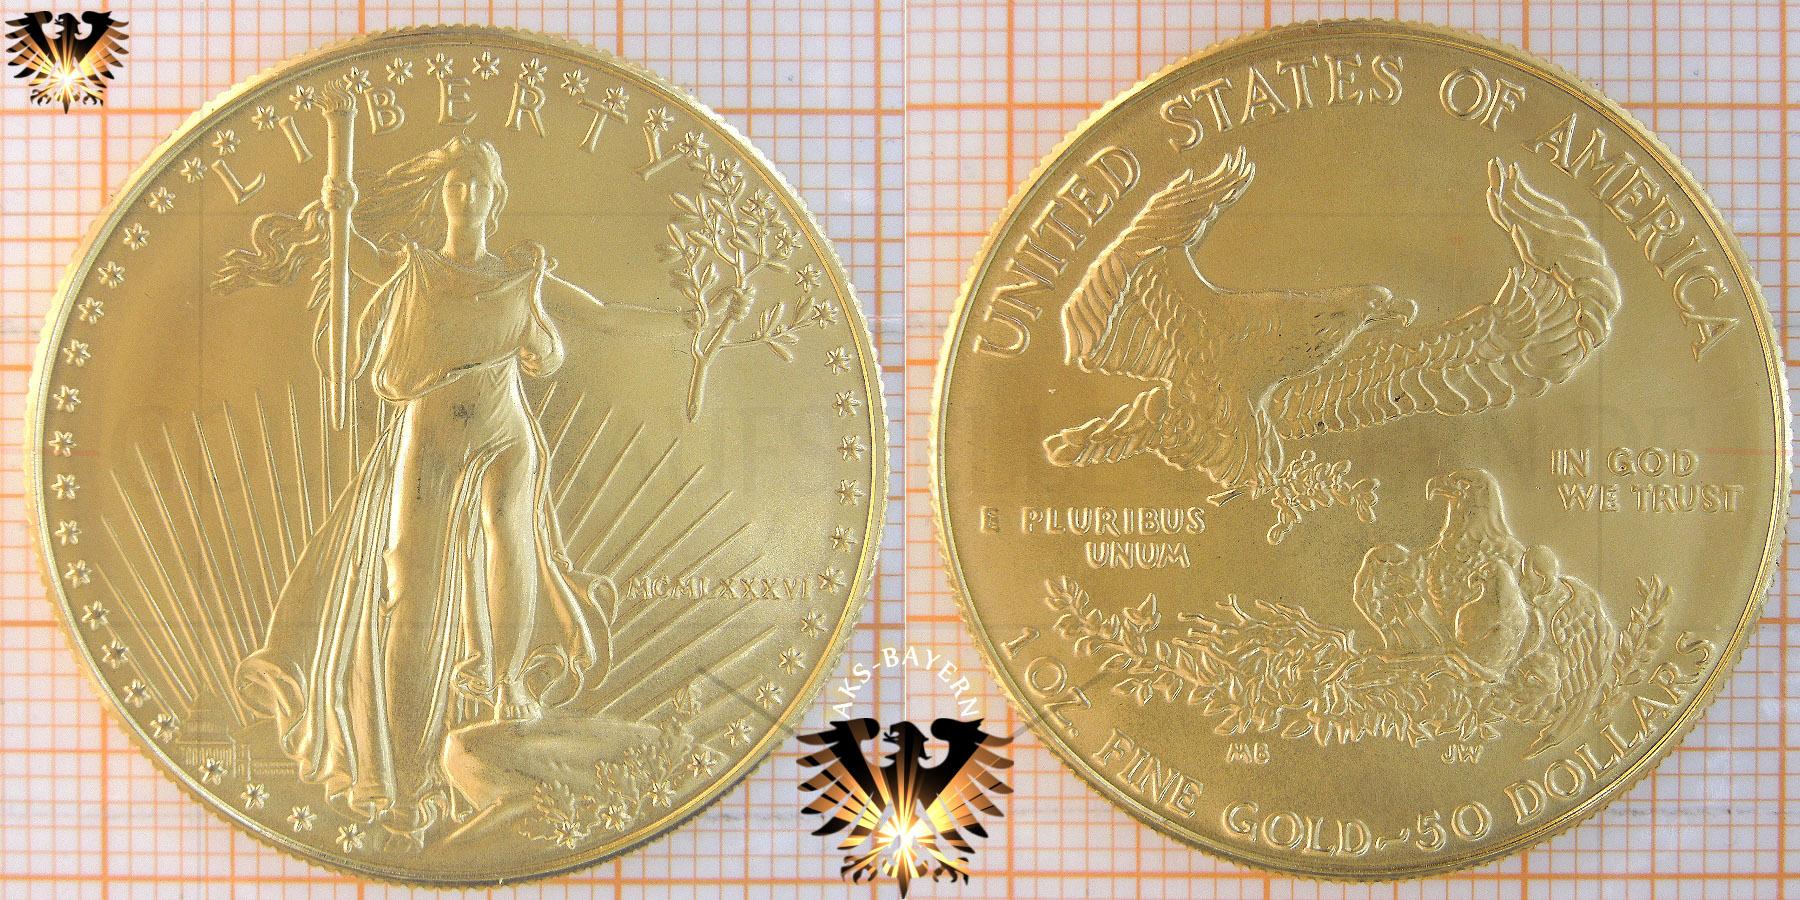 $50Dollars, Liberty, USA, 2006, American Eagle, 1 oz./1 Unze © goldankaufstelle-bayern.de